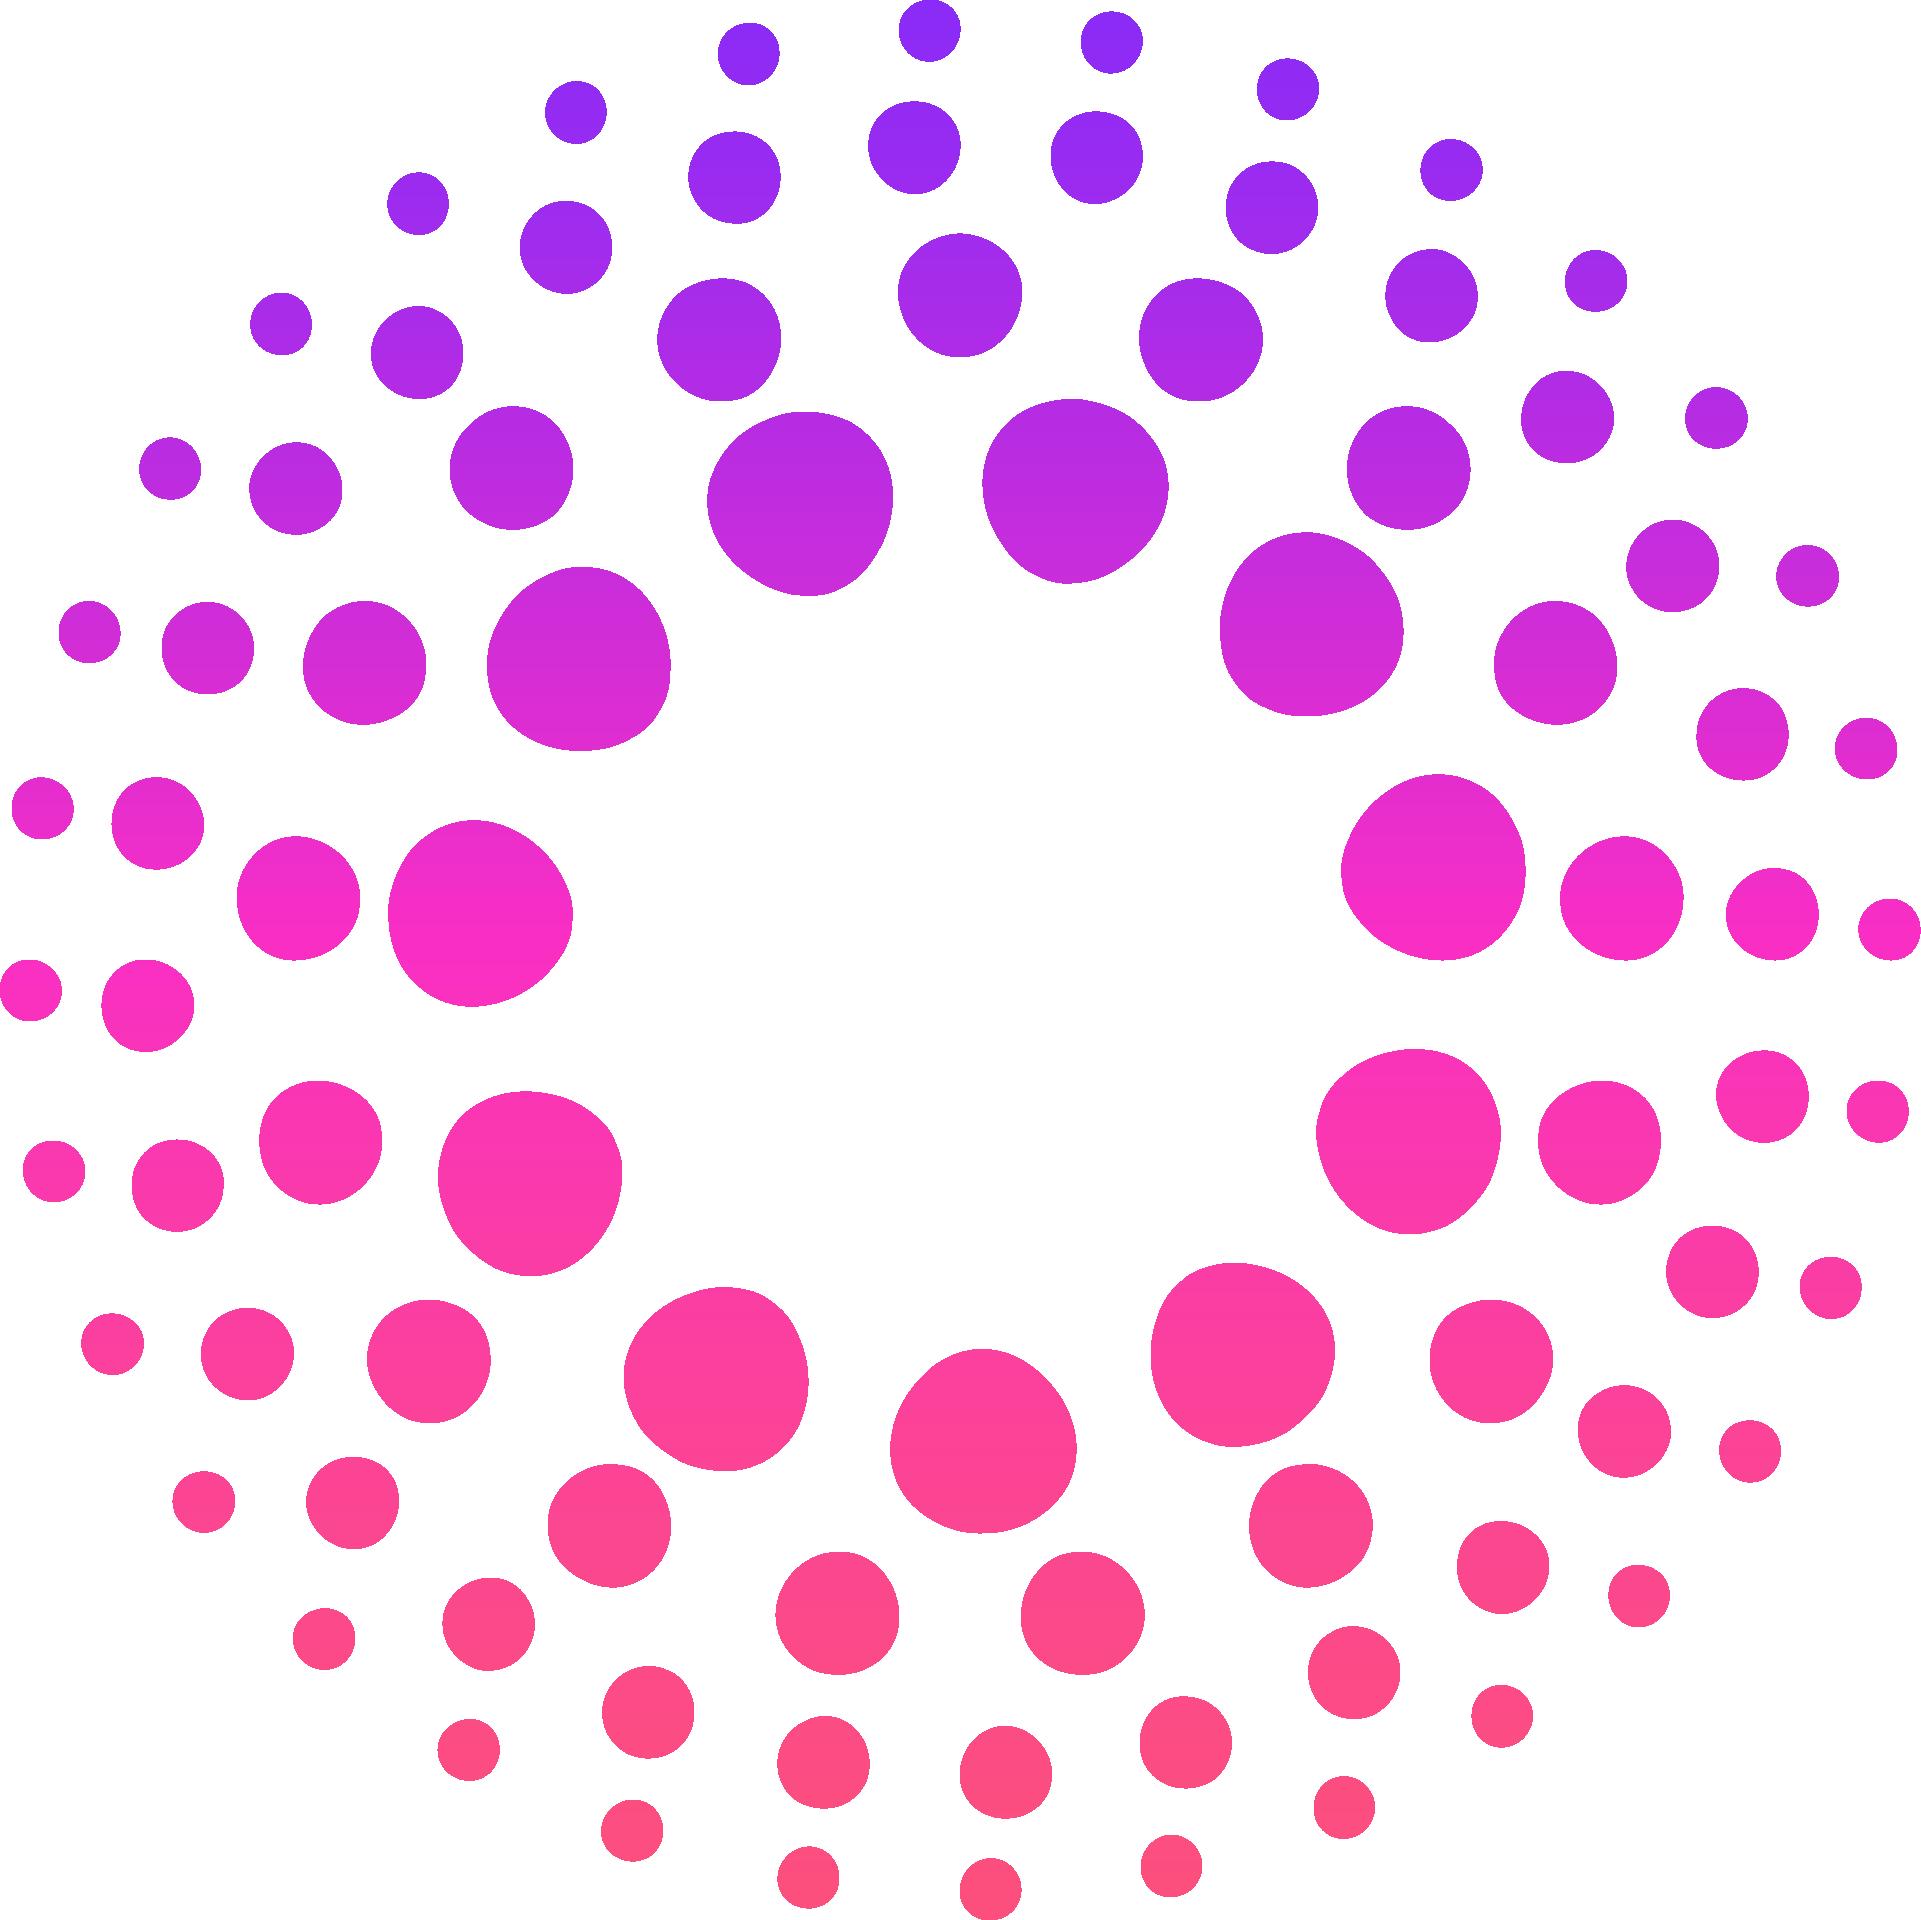 Light Pong brand pattern